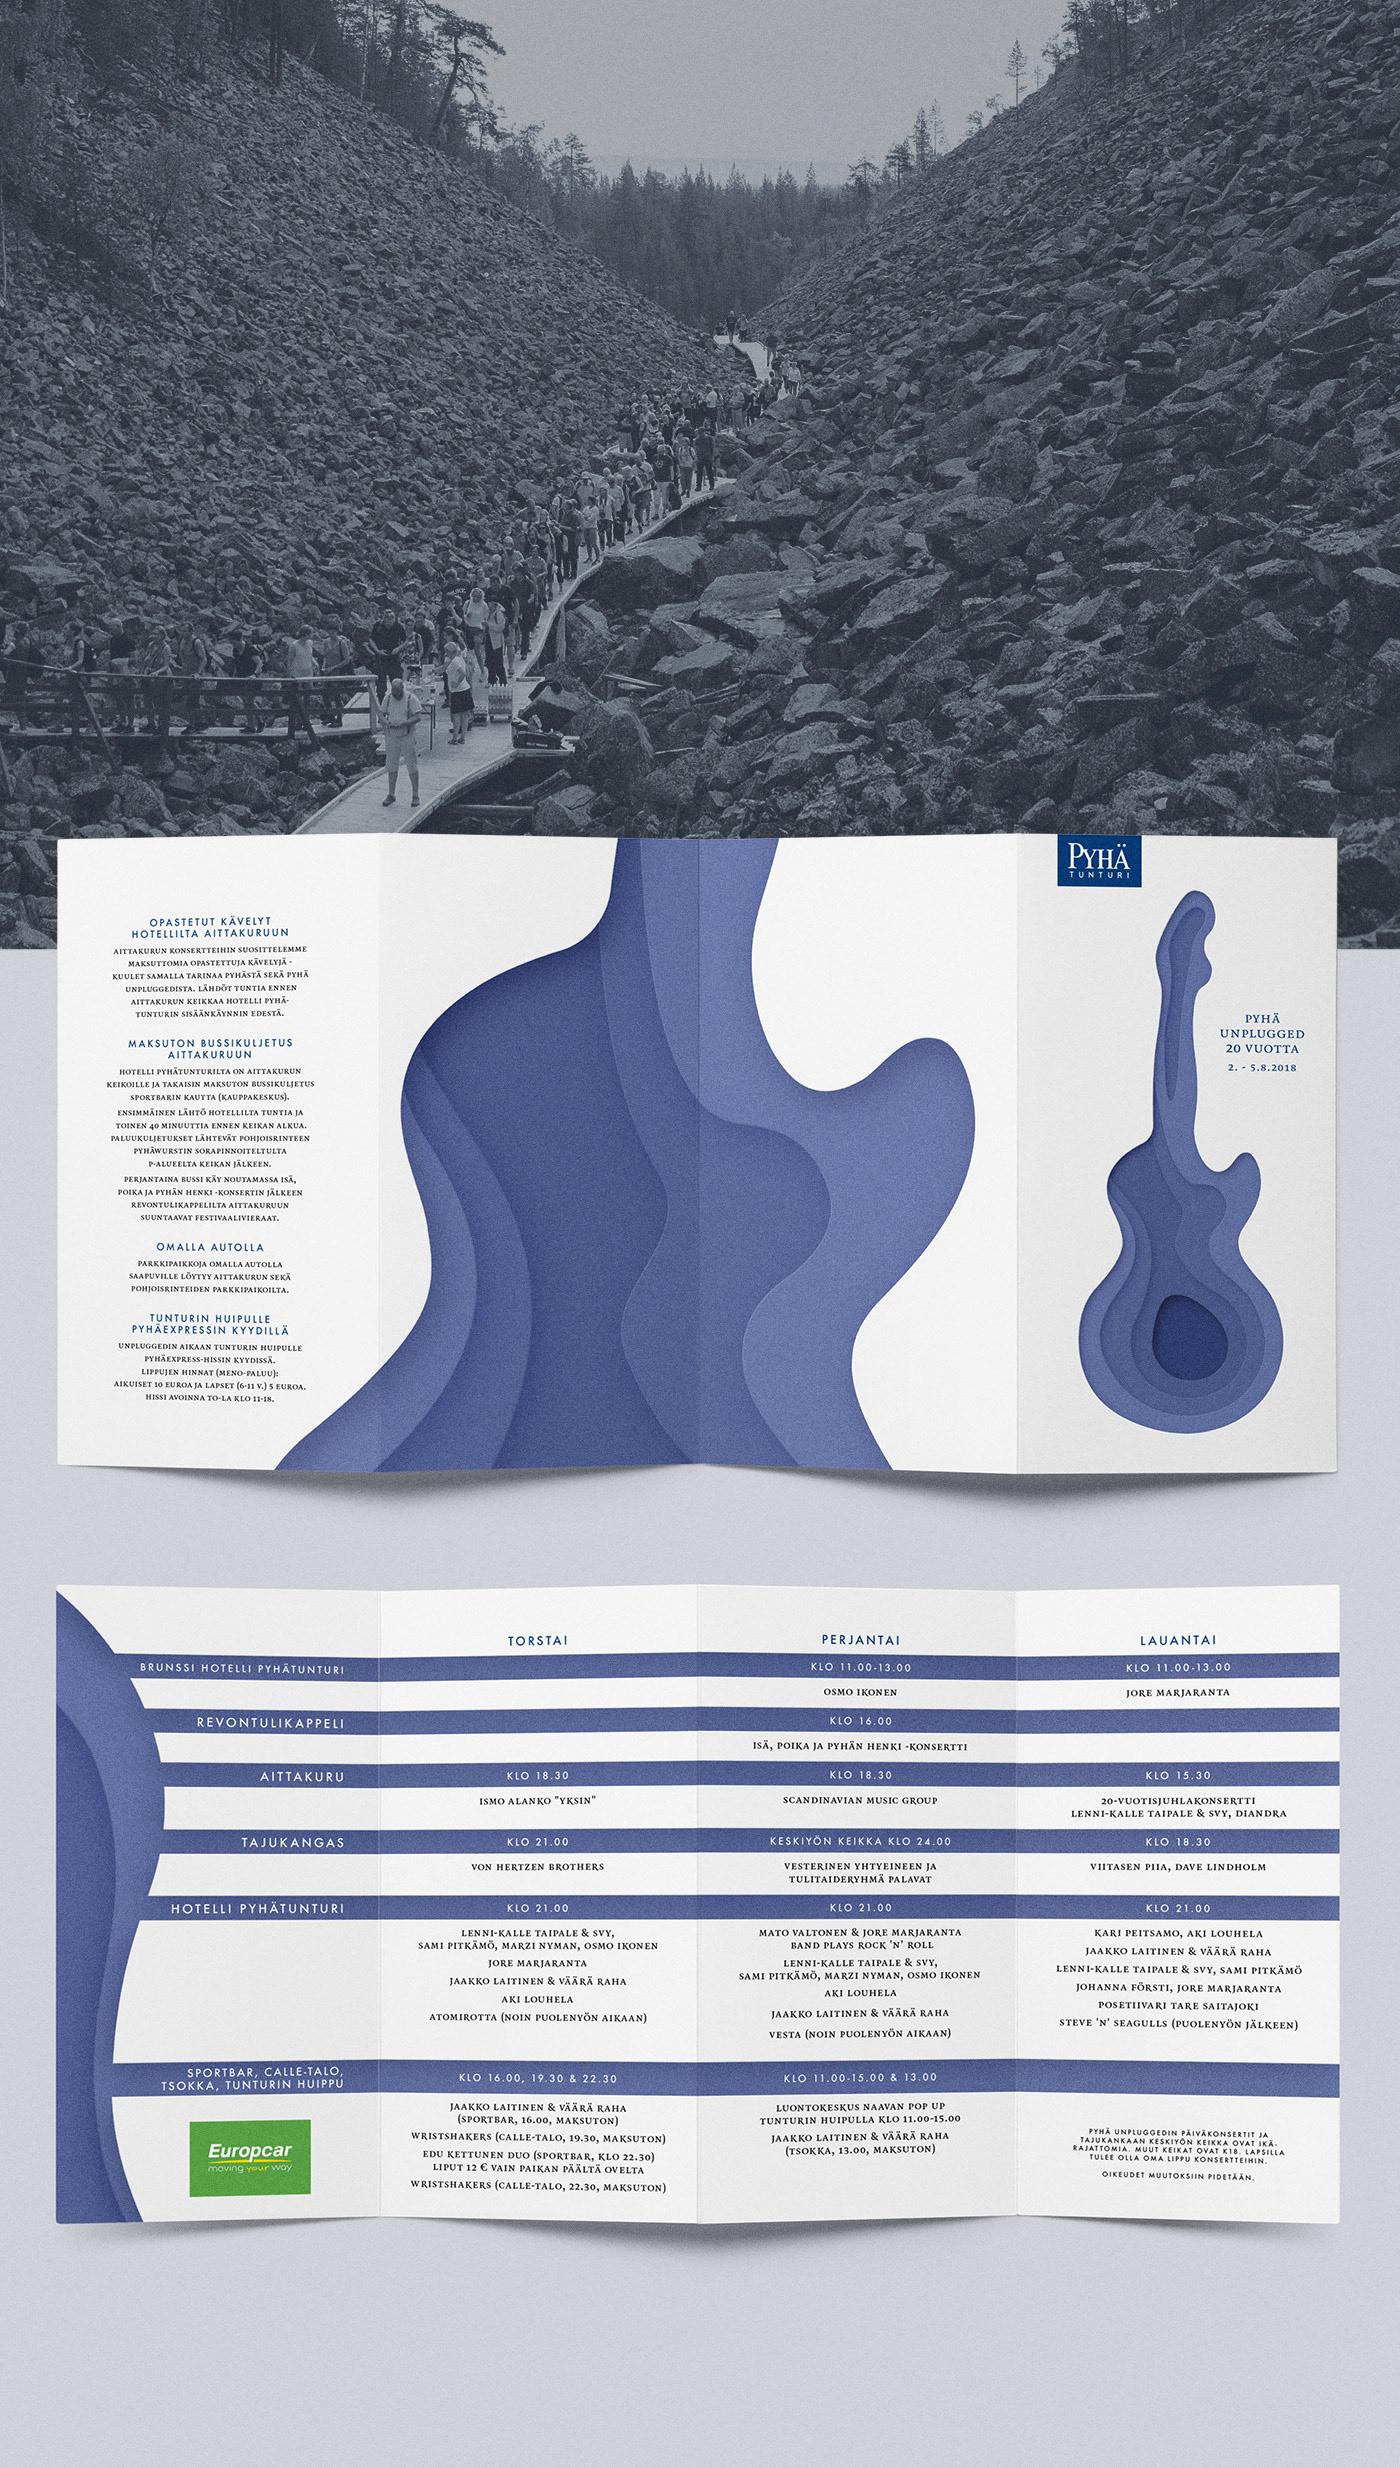 festival music Nature acoustic papercut finland topography brochure identity blue